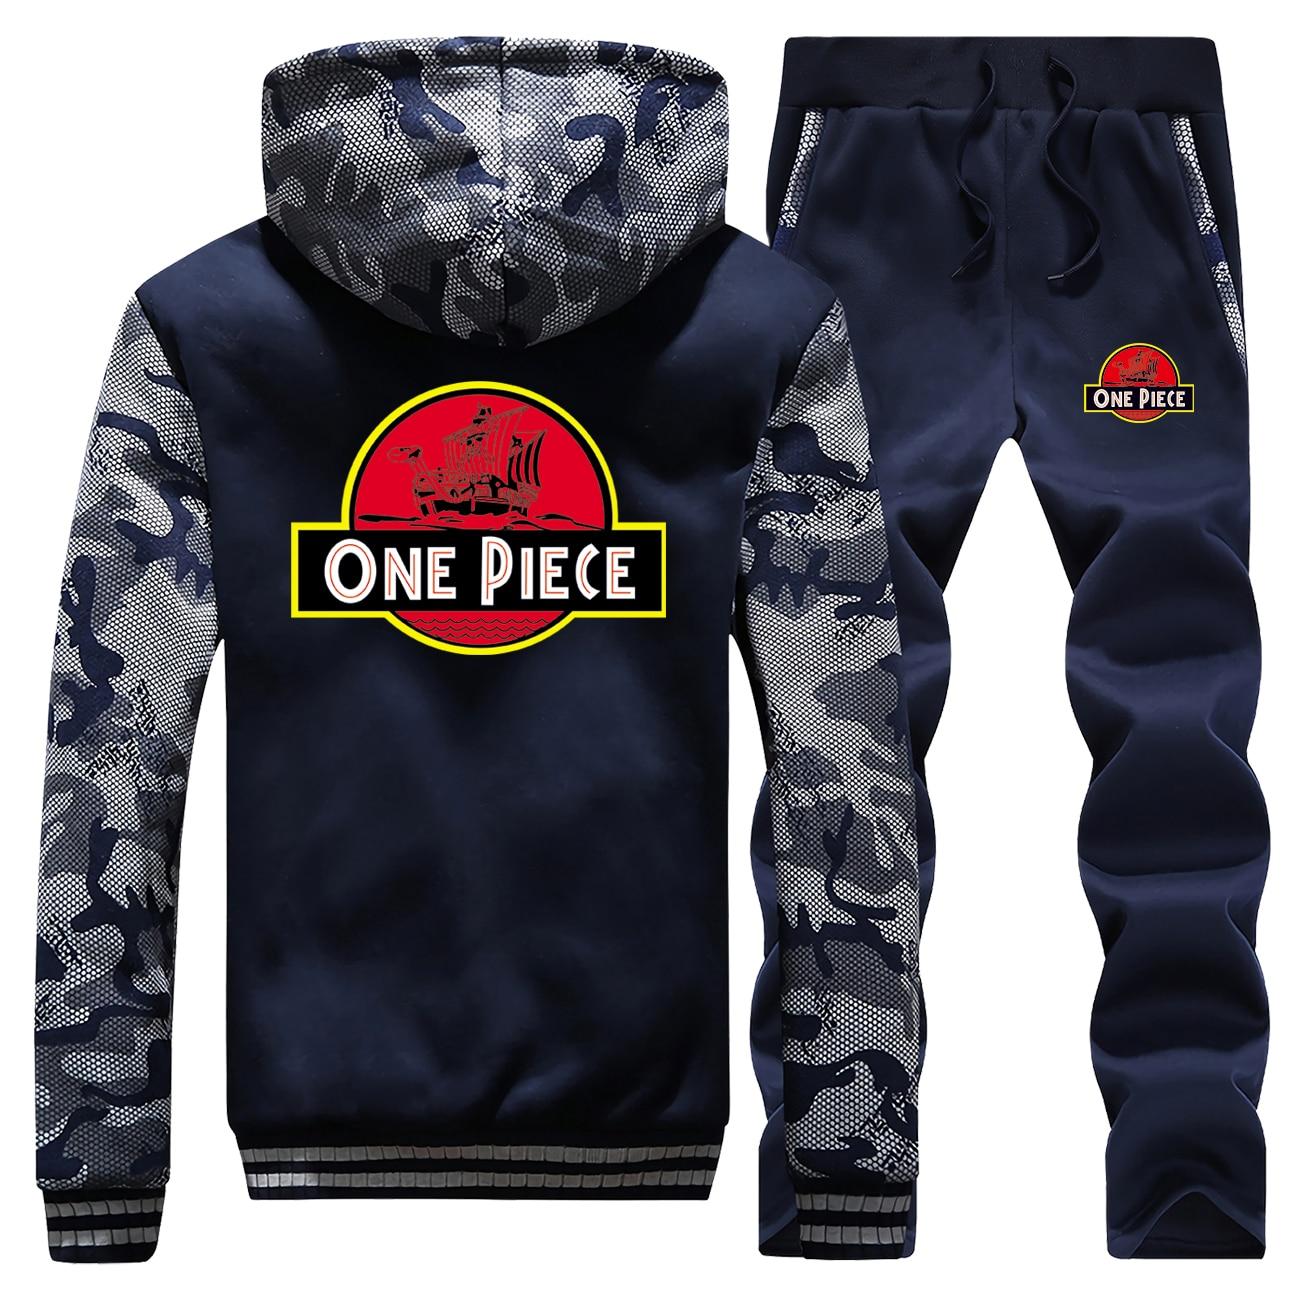 Dragon Ball Tracksuits Jacket Pant Set Vegeta Gohan Sportsuits Men Sweatshirts Hoodies Sweatpant Sets Suit 2 PCS Camo Sportswear